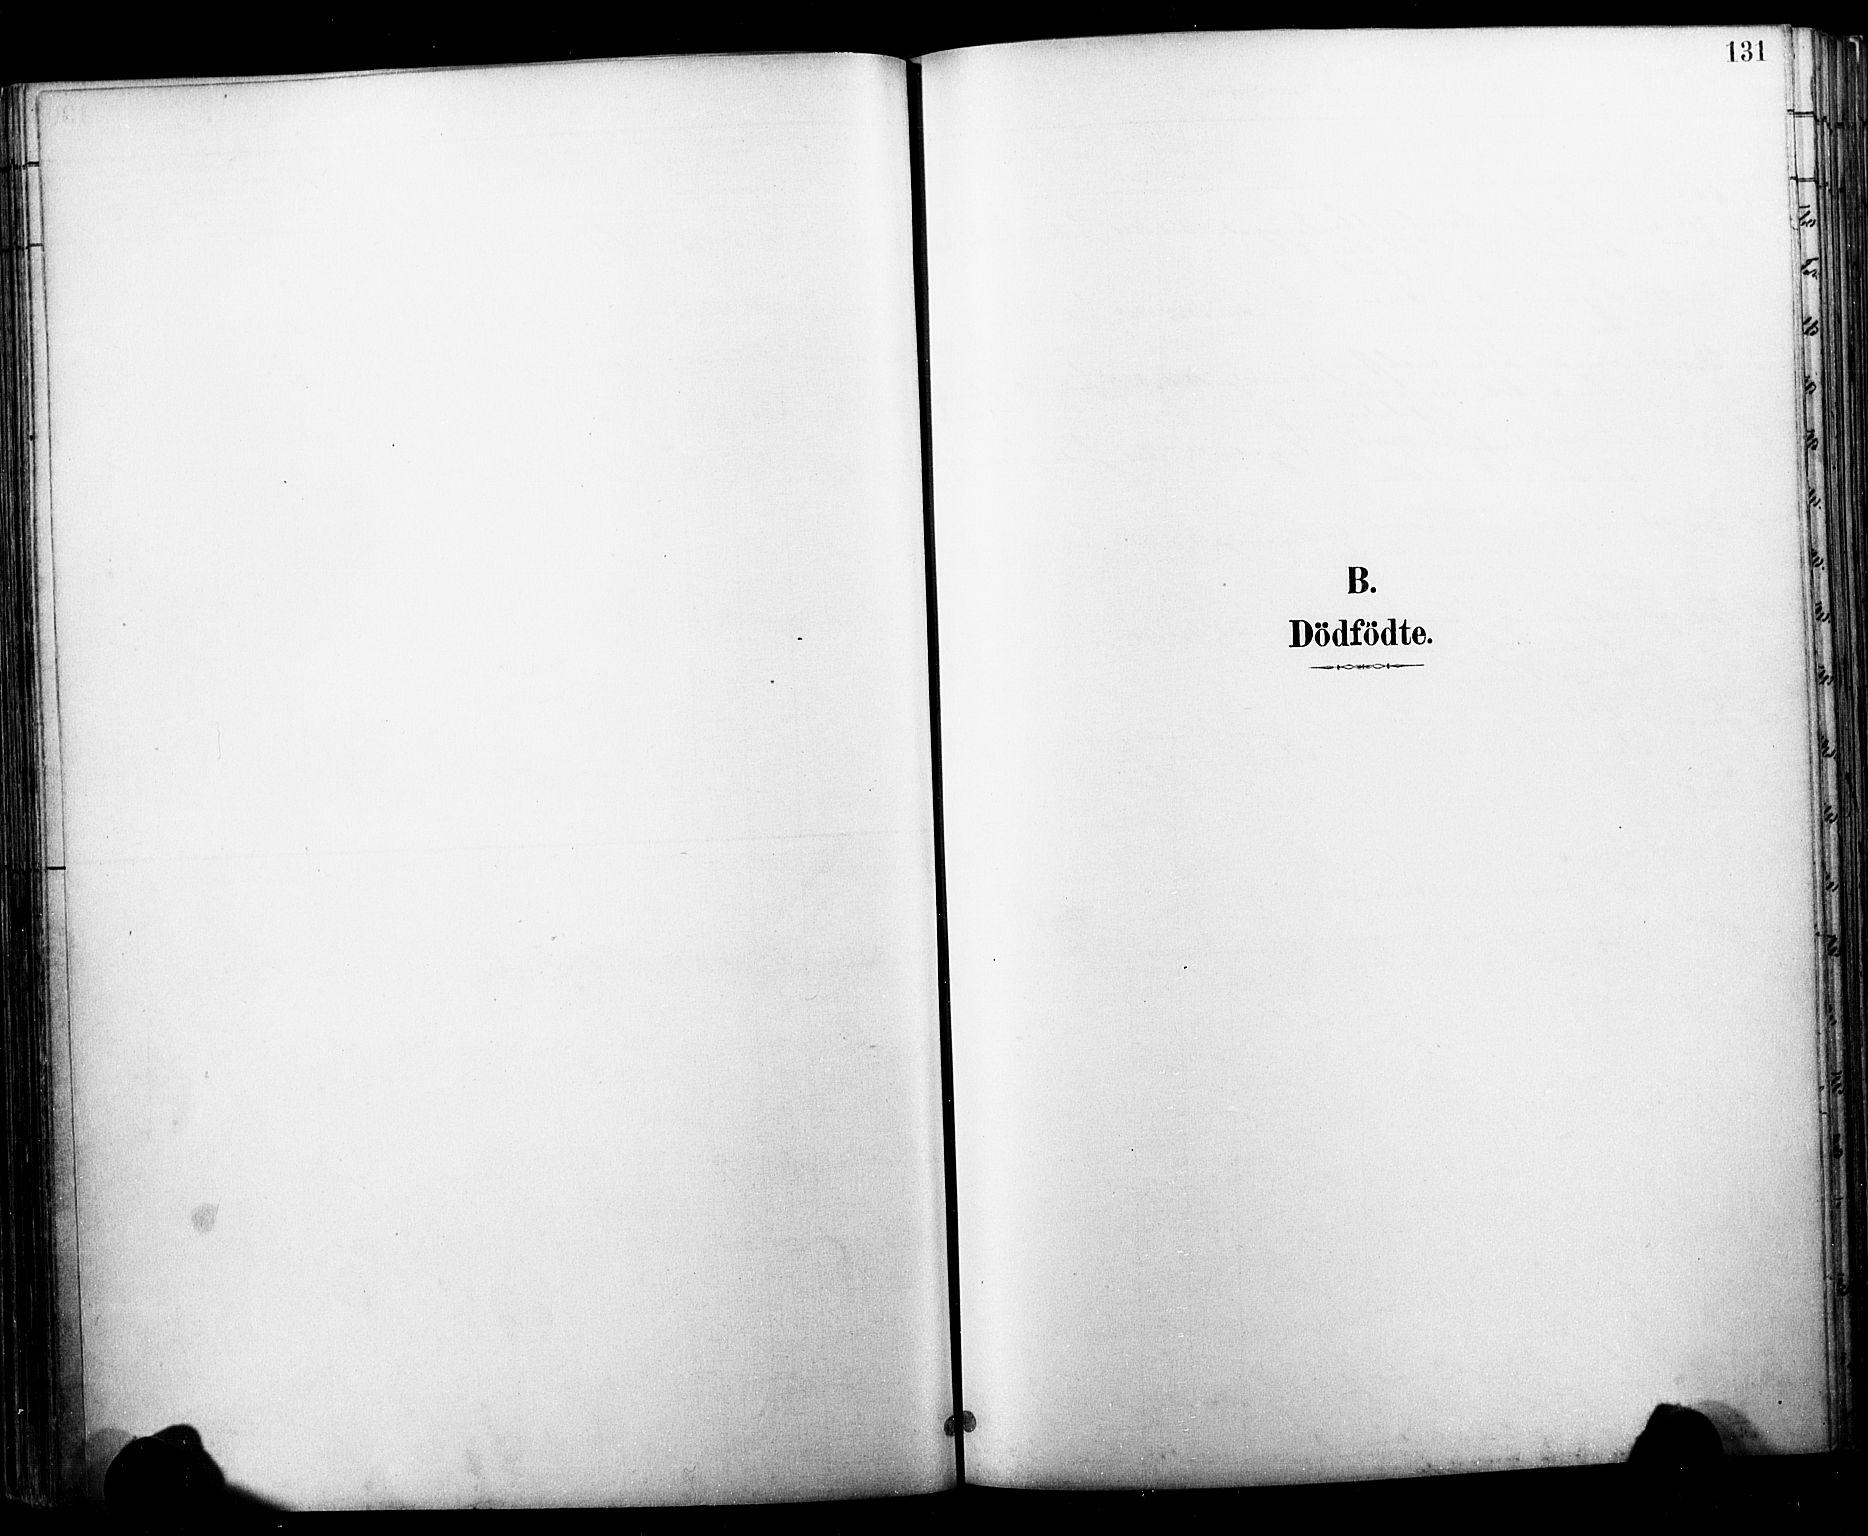 SAKO, Horten kirkebøker, F/Fa/L0004: Parish register (official) no. 4, 1888-1895, p. 131